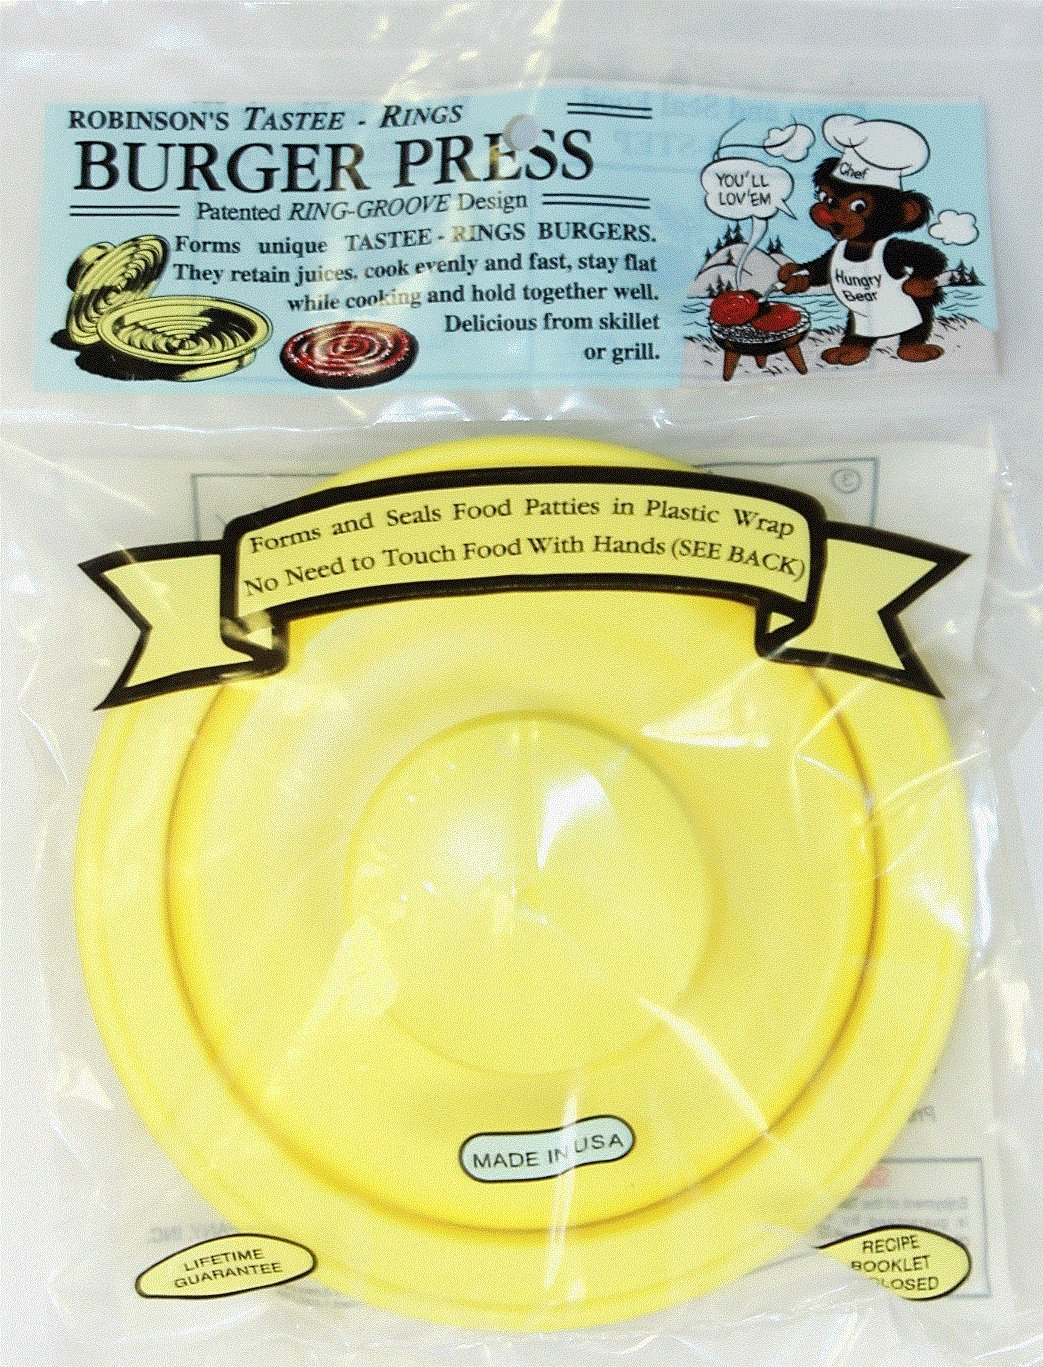 Robinsons Tastee Rings Burger Press